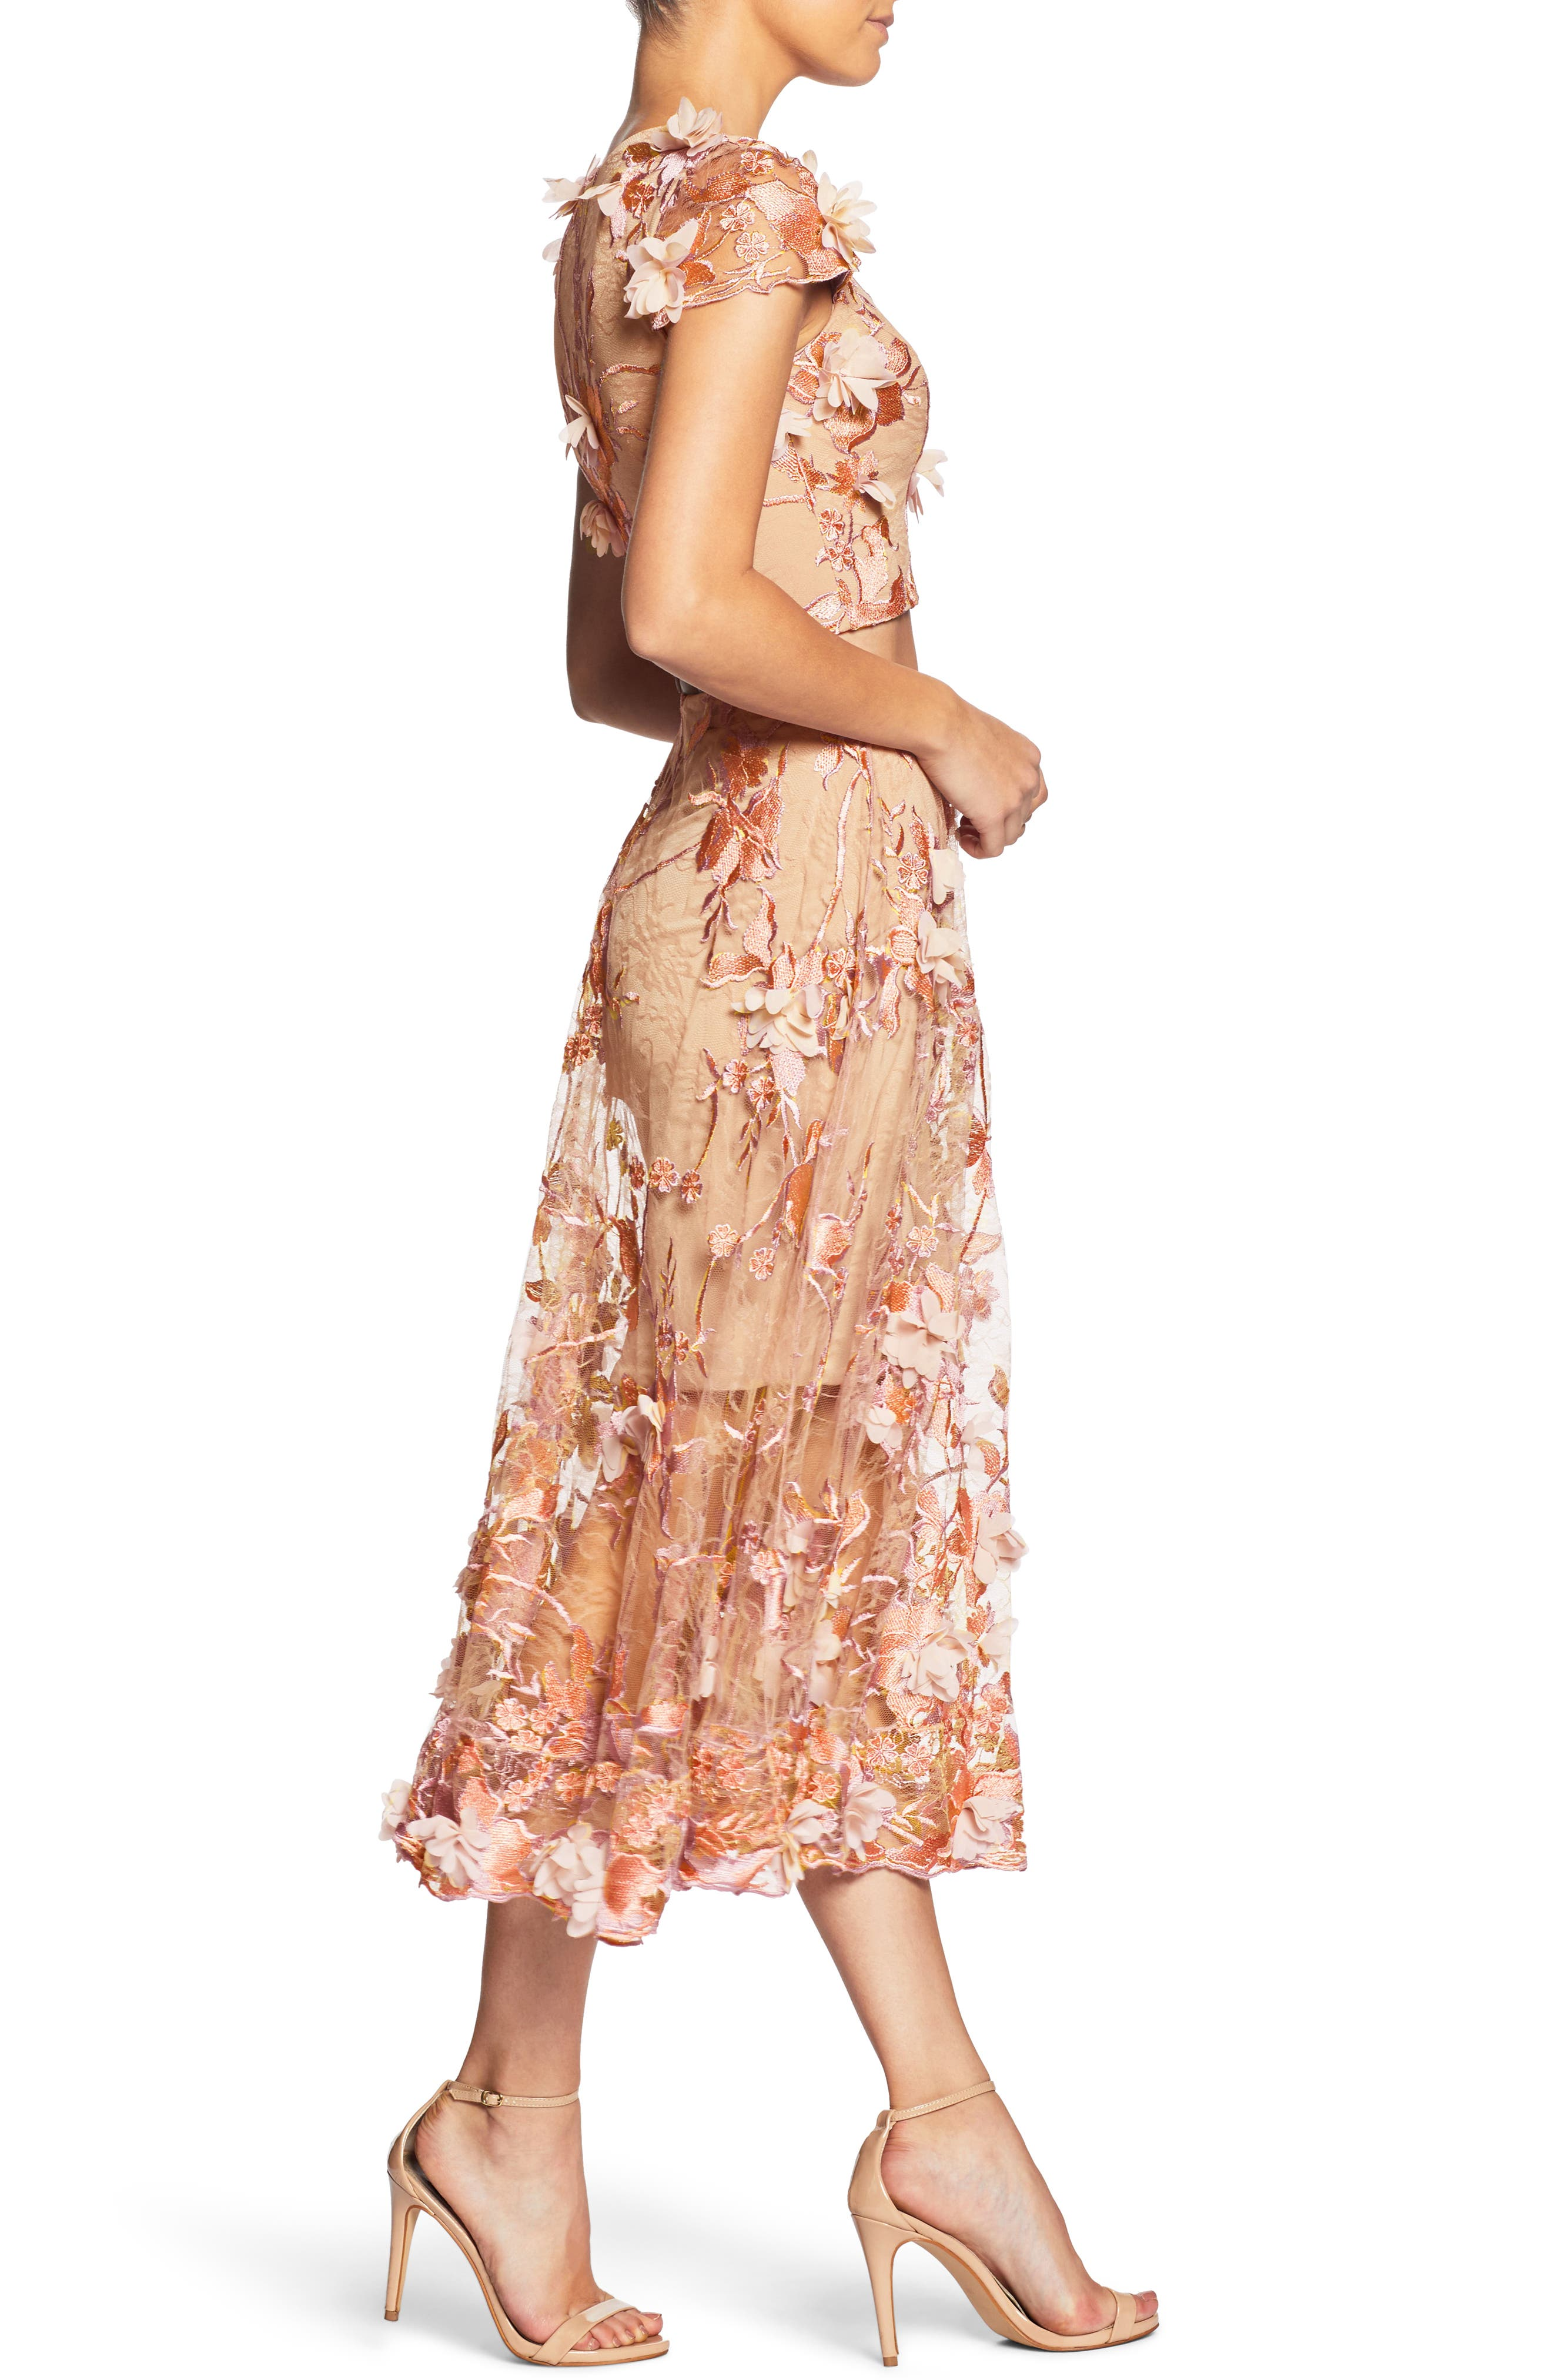 Juliana 3D Lace Two-Piece Dress,                             Alternate thumbnail 3, color,                             Peach